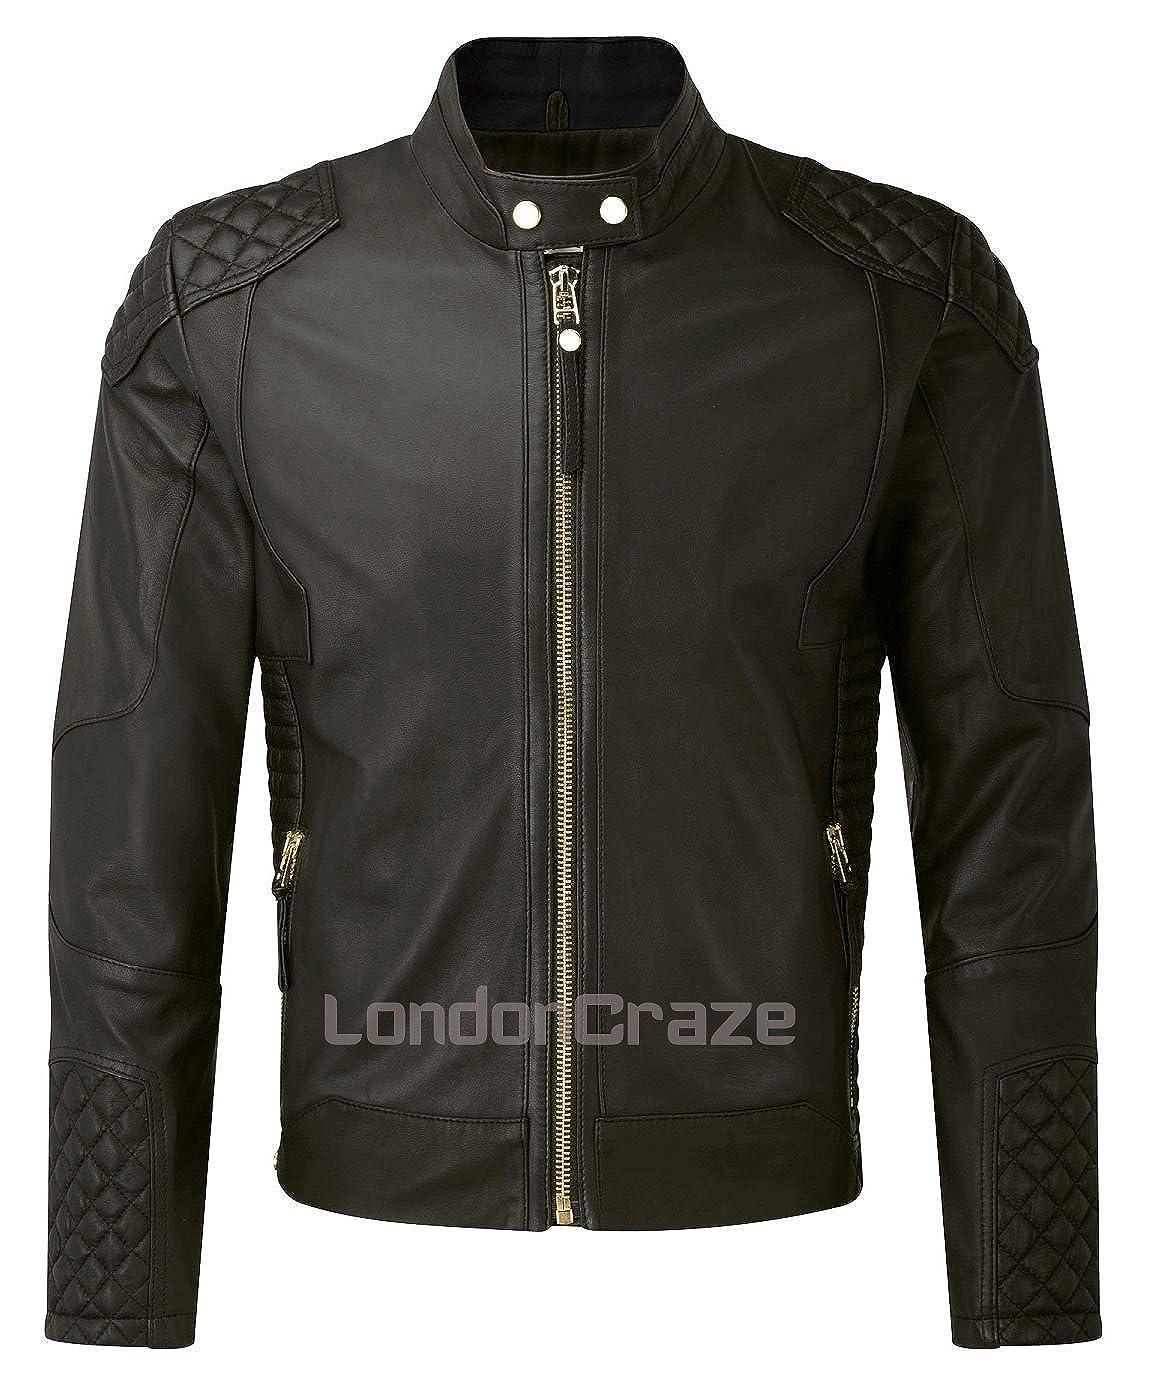 London Craze Mens Leather Jacket Stylish Motorcycle Biker Pure Lambskin Black